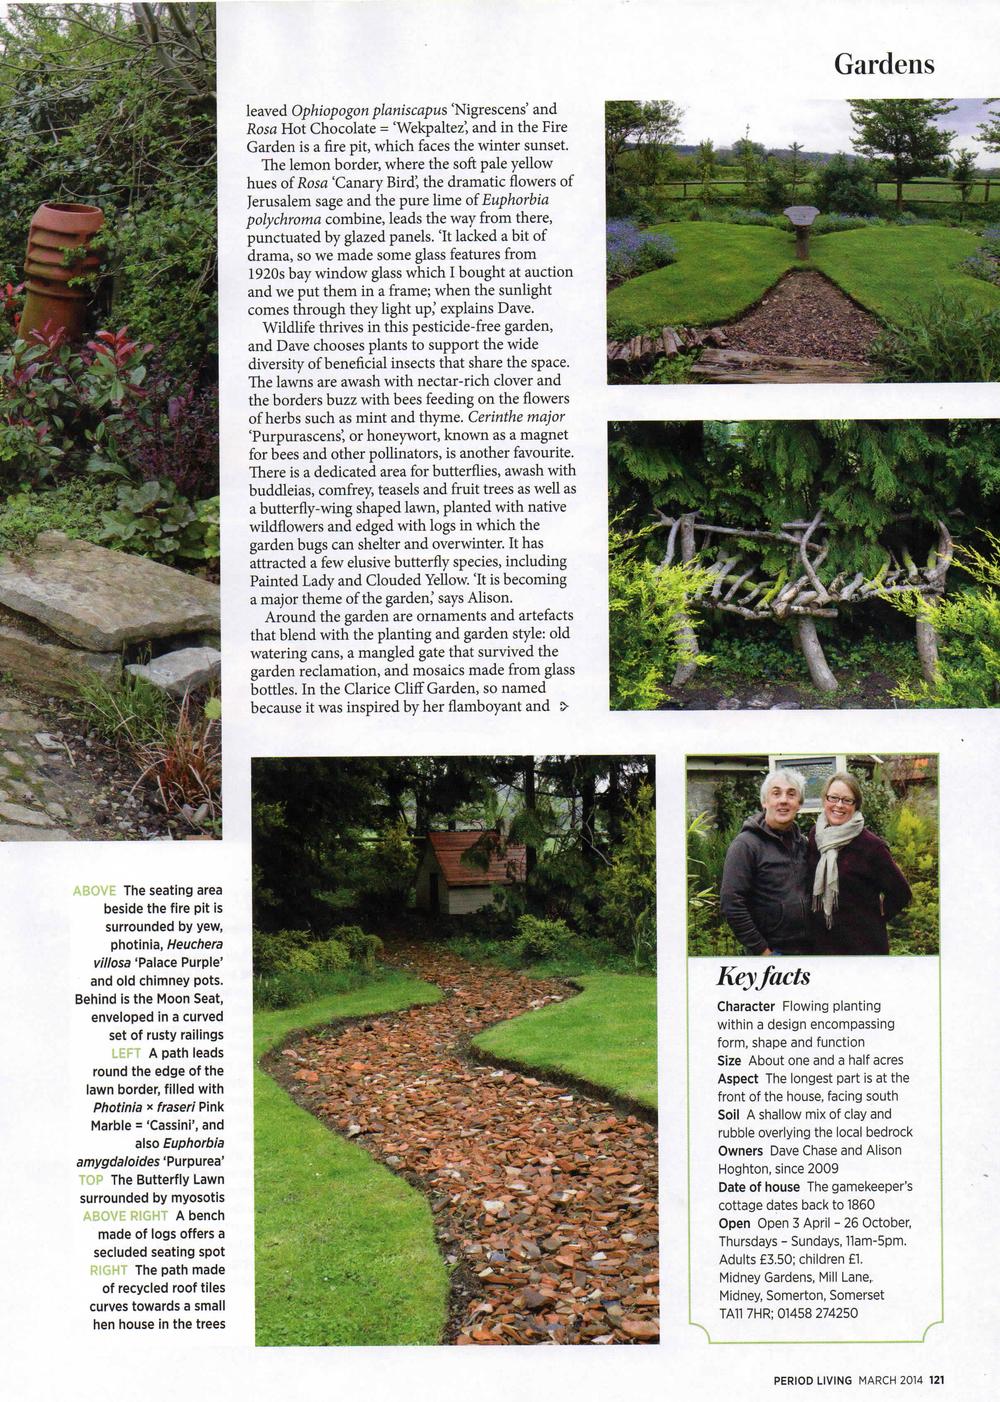 Midney Gardens001-4.jpg